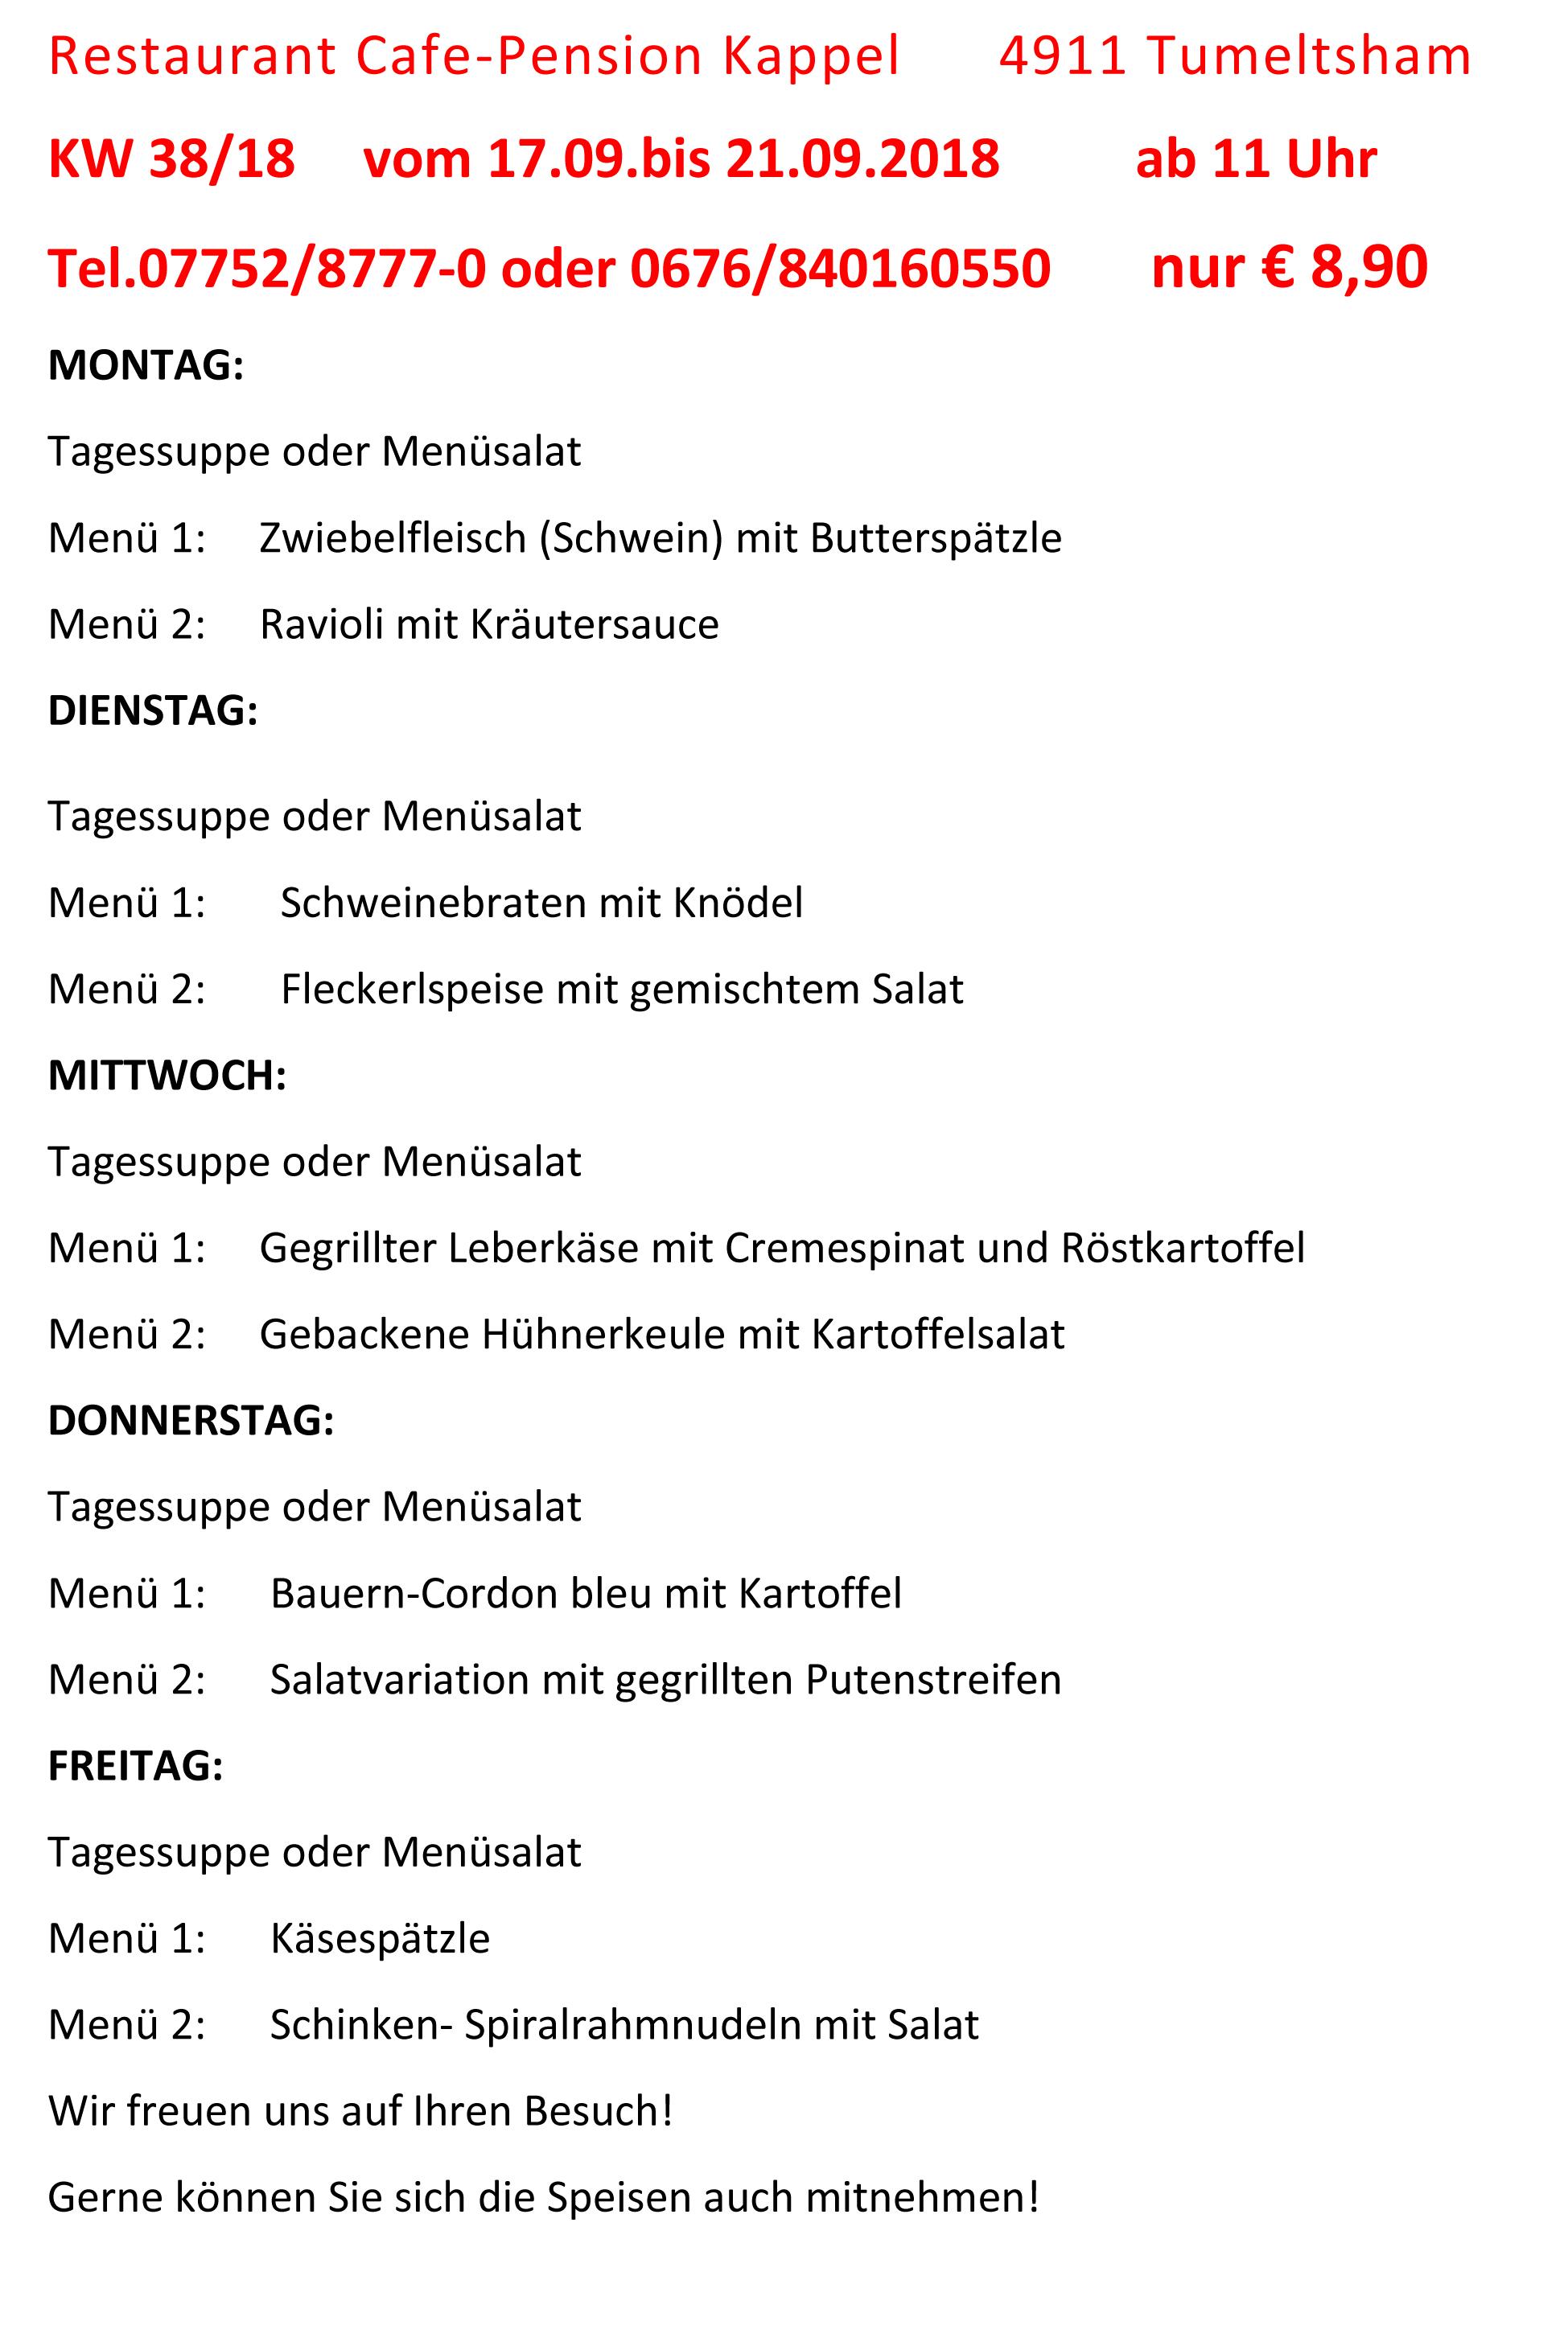 Menüplan KW 38-18 (1)